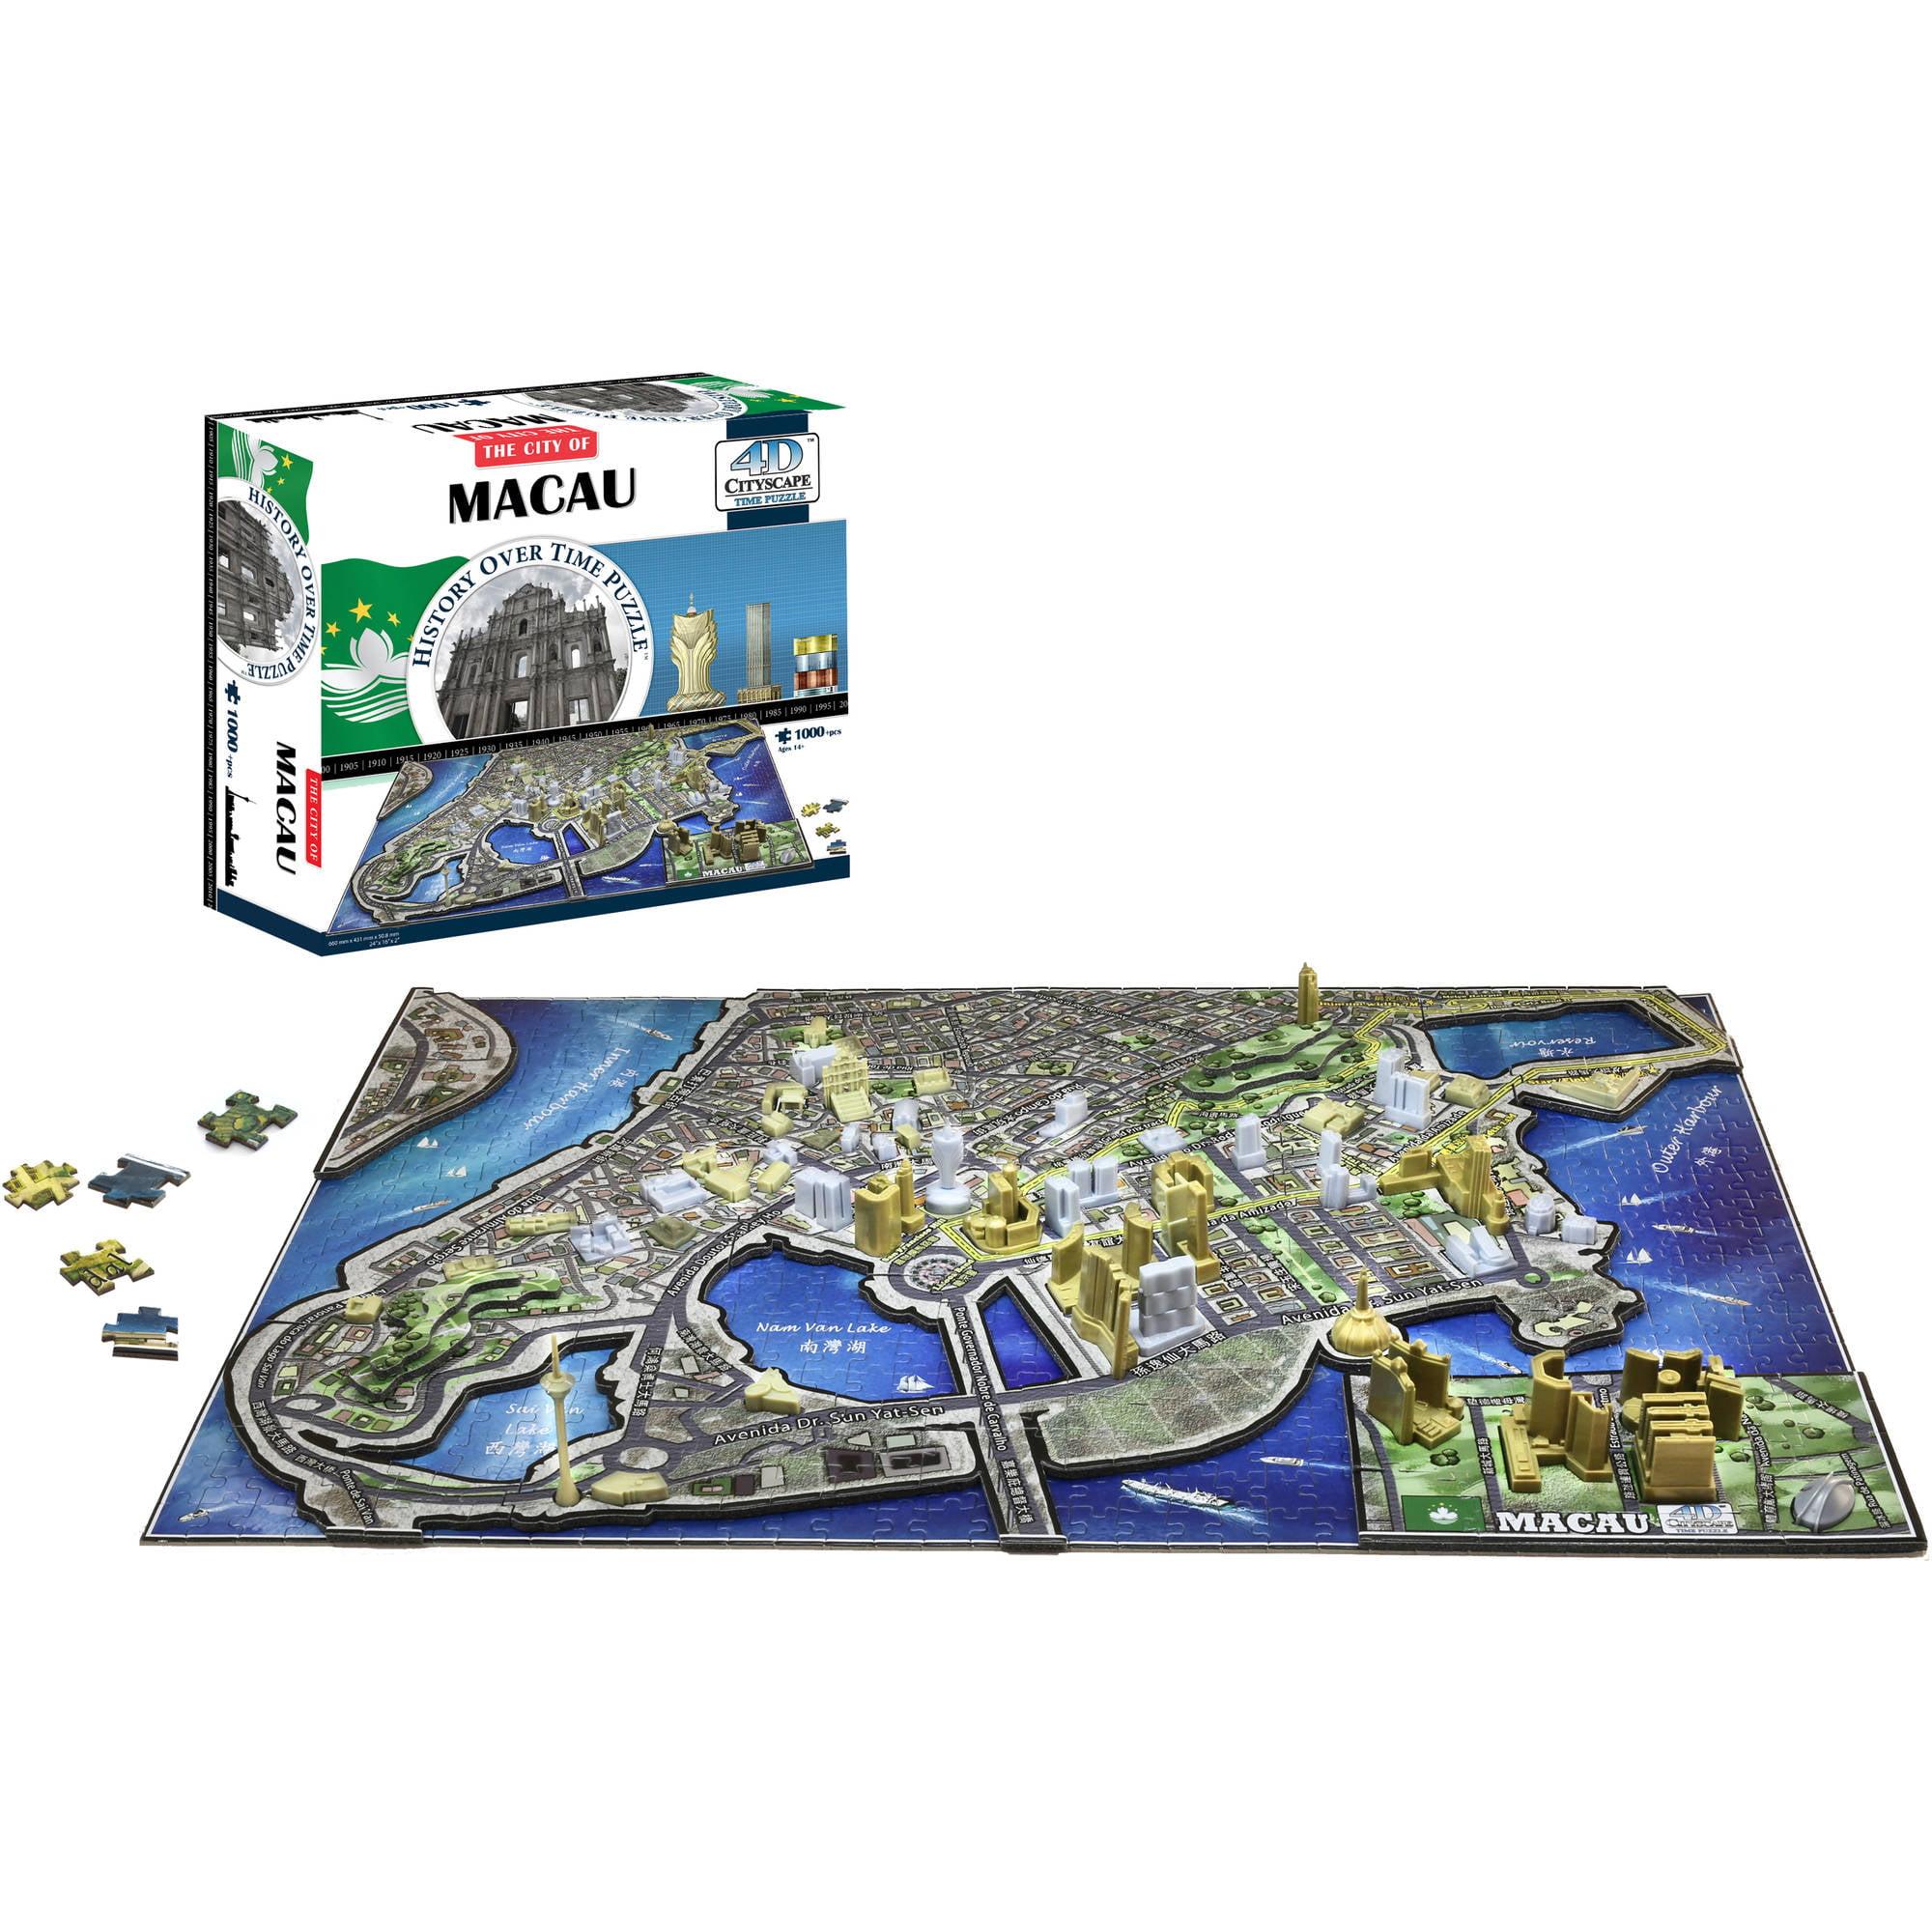 4D Macau, China Jigsaw Puzzle